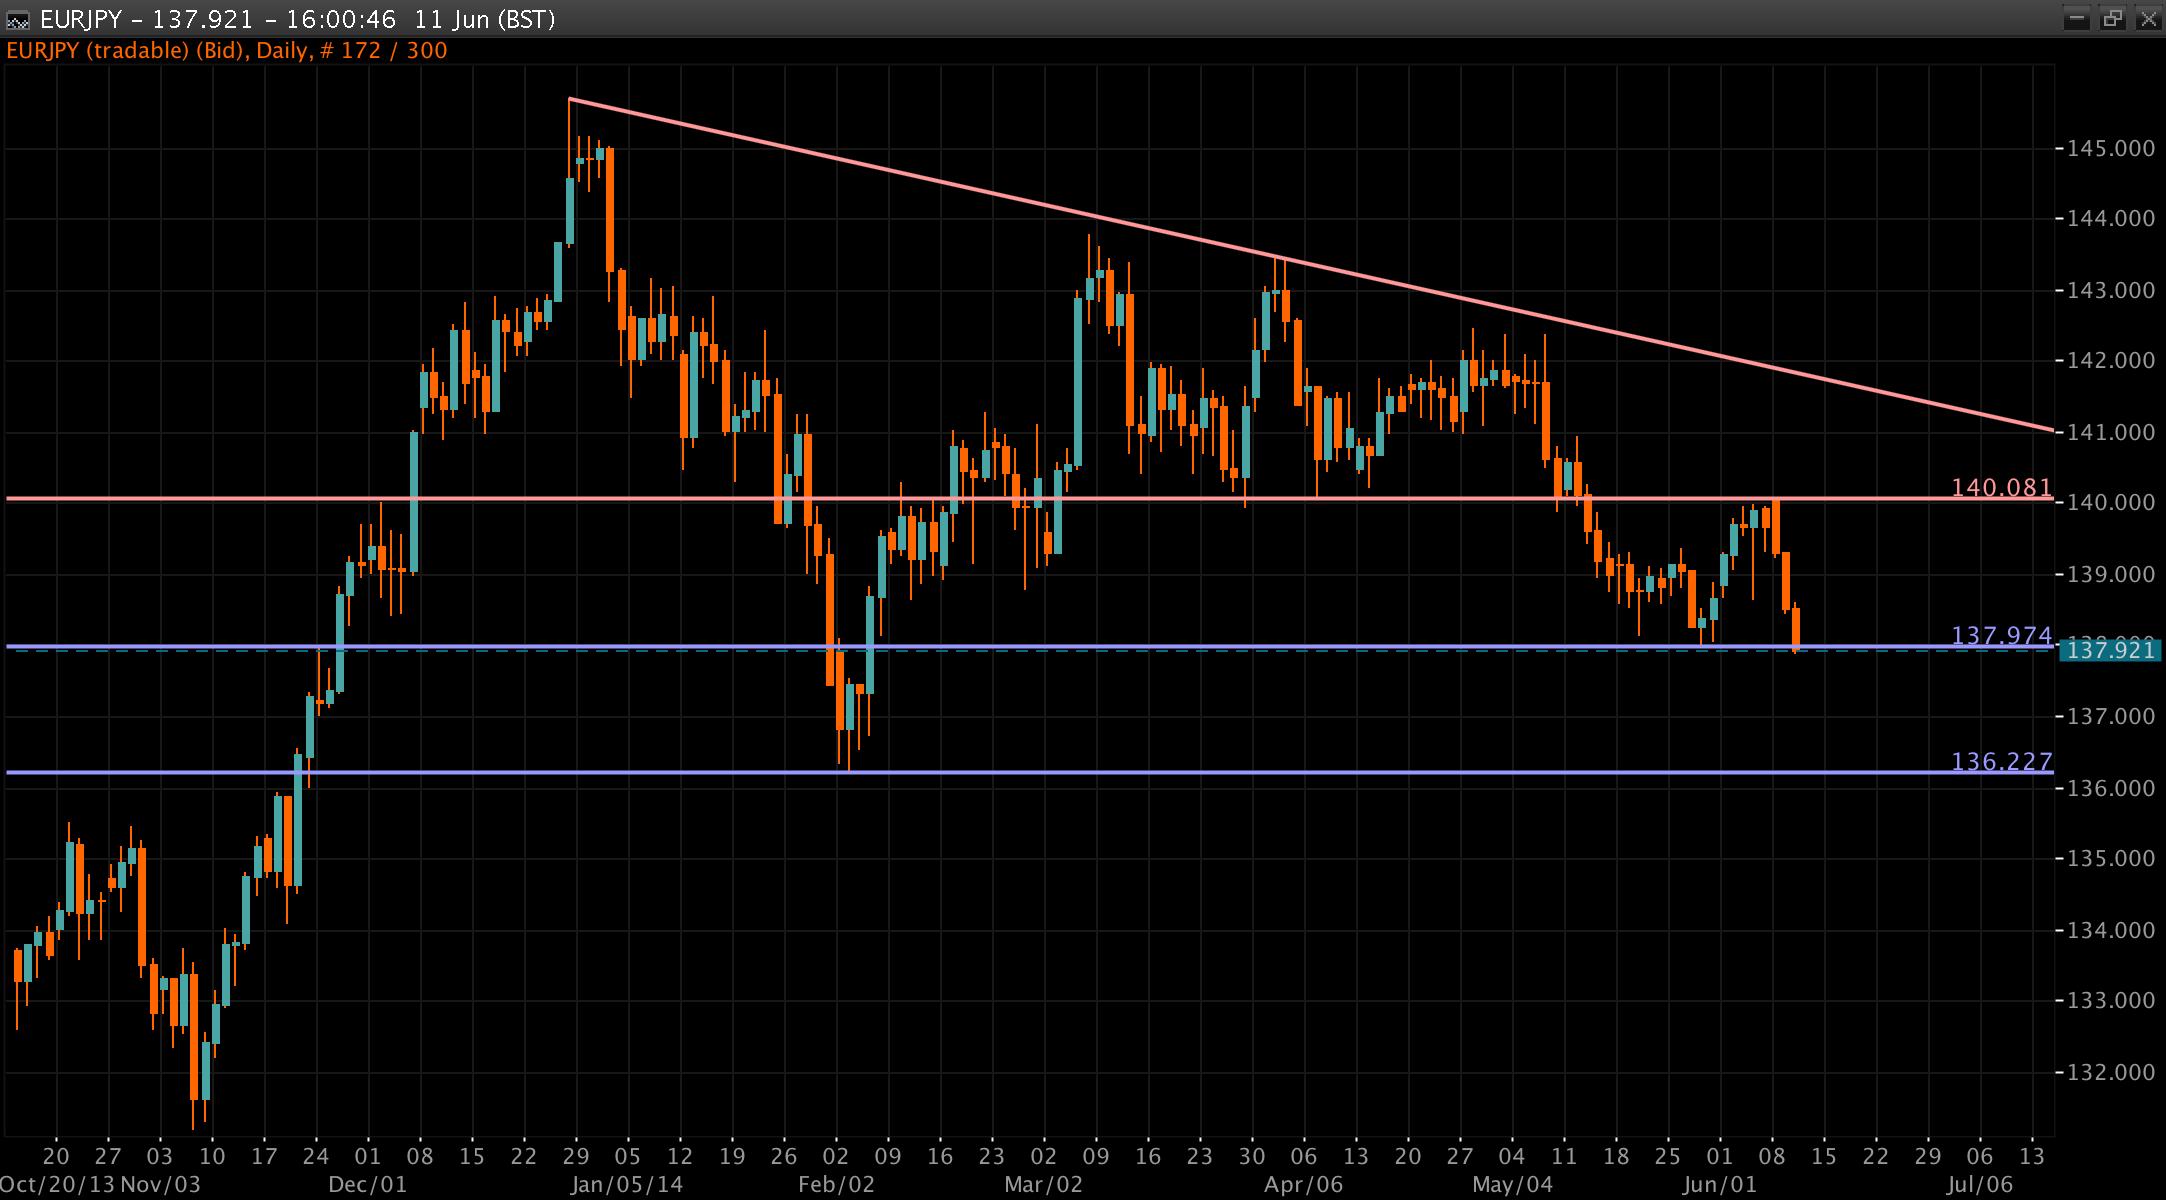 EUR/JPY Chart 11 Jun 2014